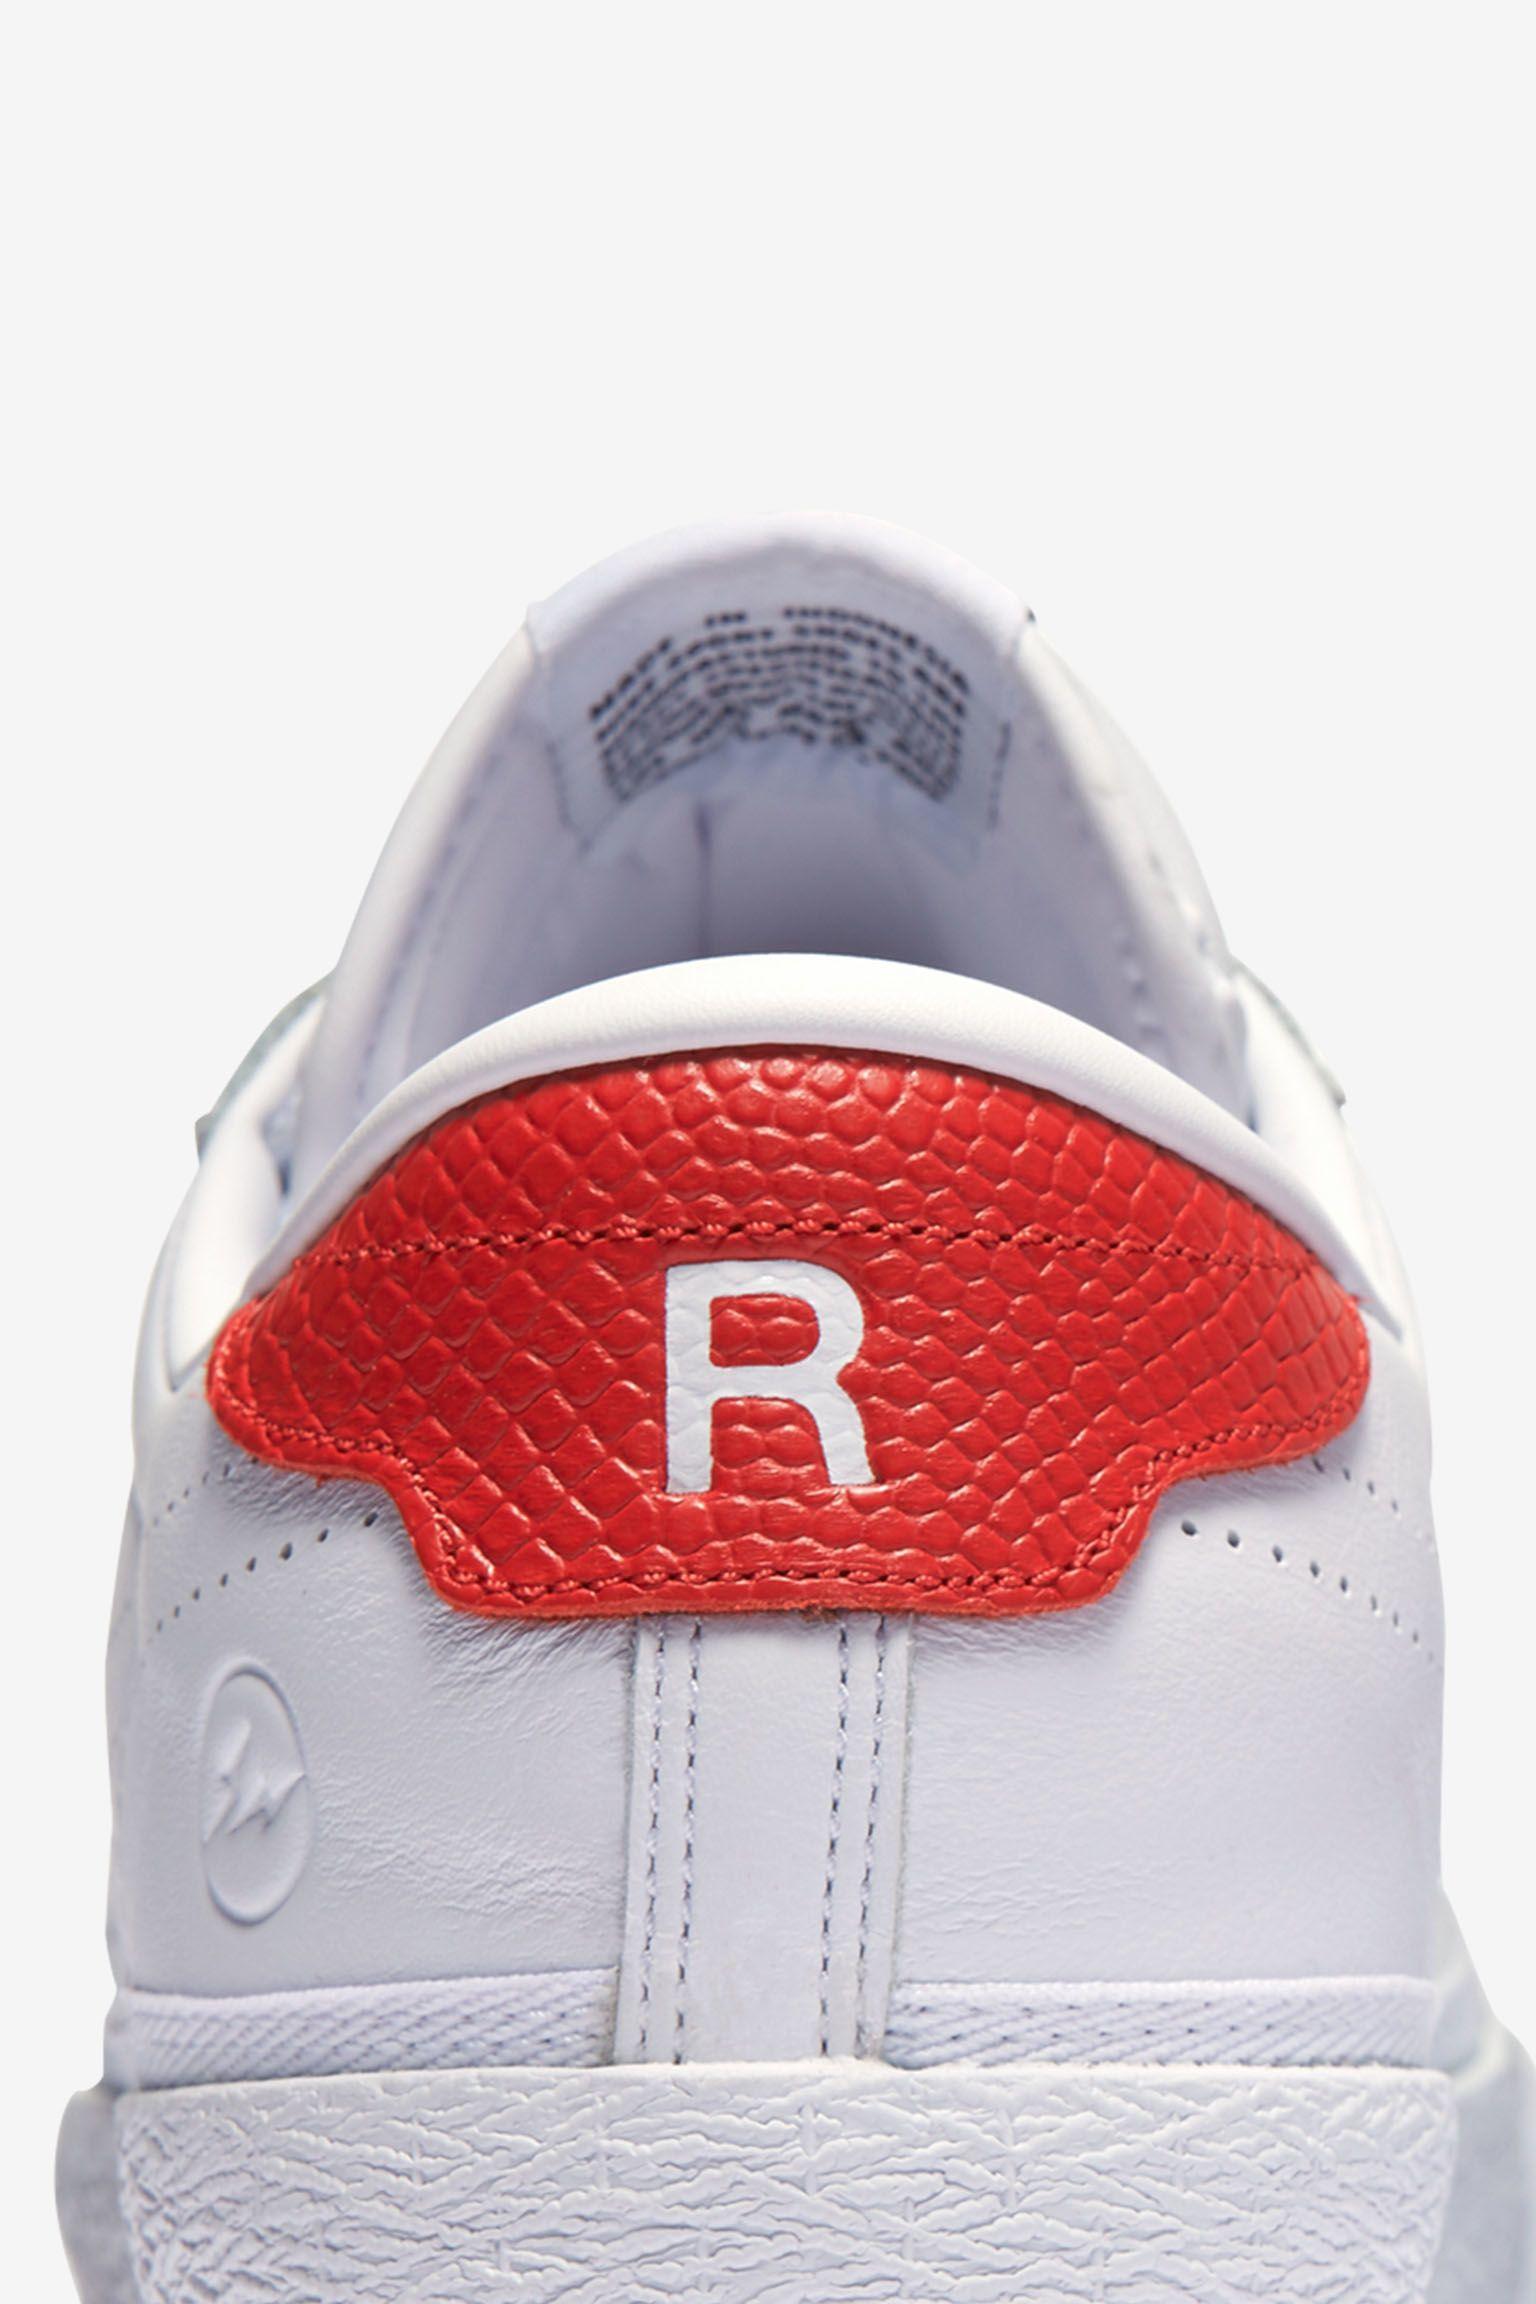 NikeLab x Fragment Zoom Tennis Classic 'White & University Red'